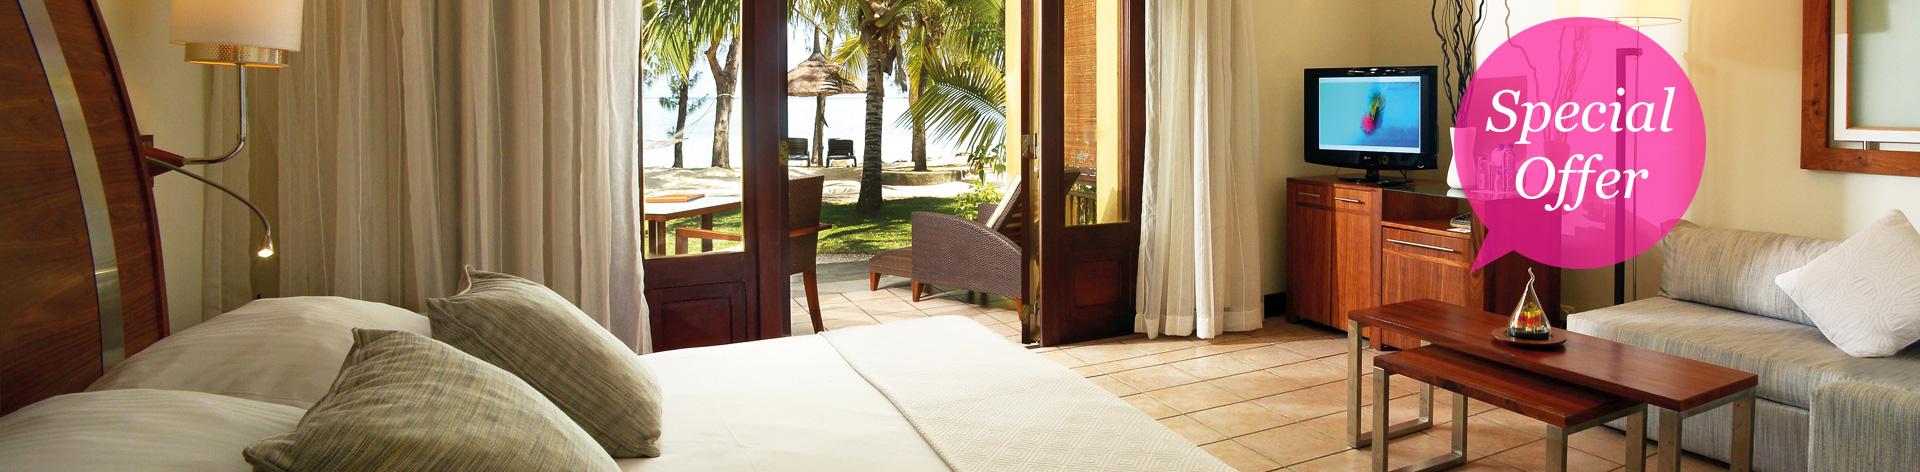 Get 30% DISCOUNT in a 4 & 5 star Hotel in Mauritius